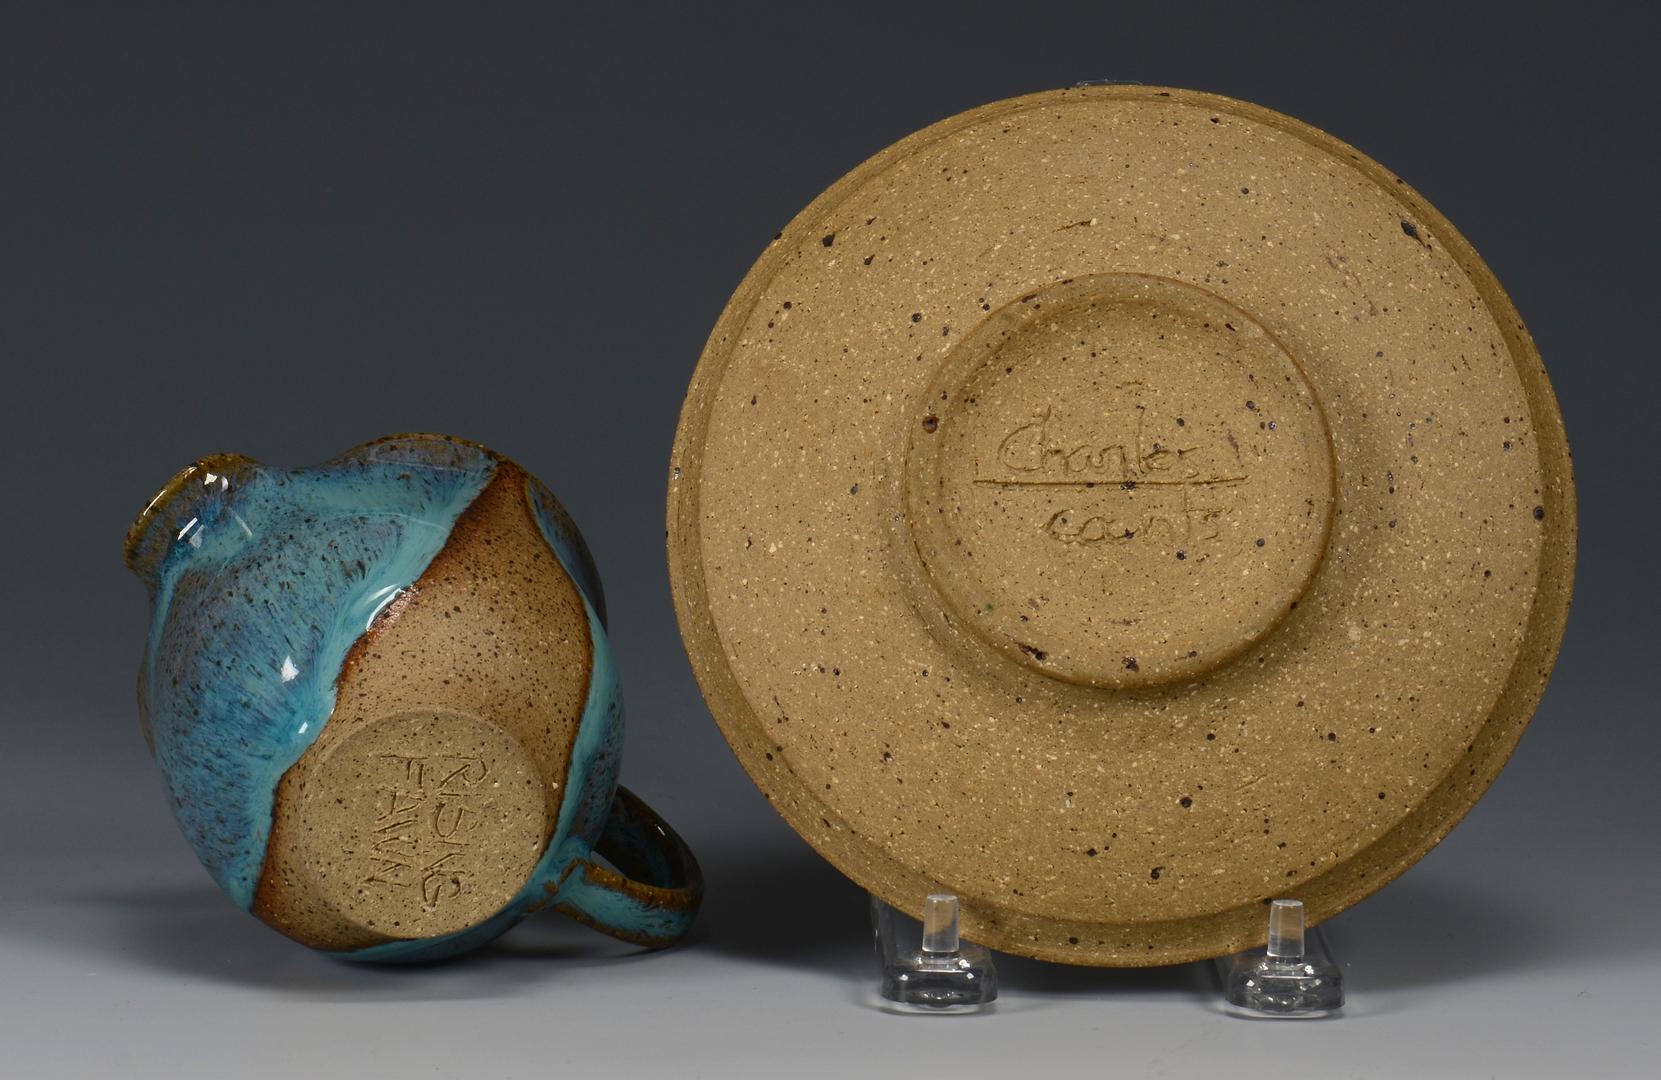 Lot 496: 4 Pcs. Charles Counts Art Pottery